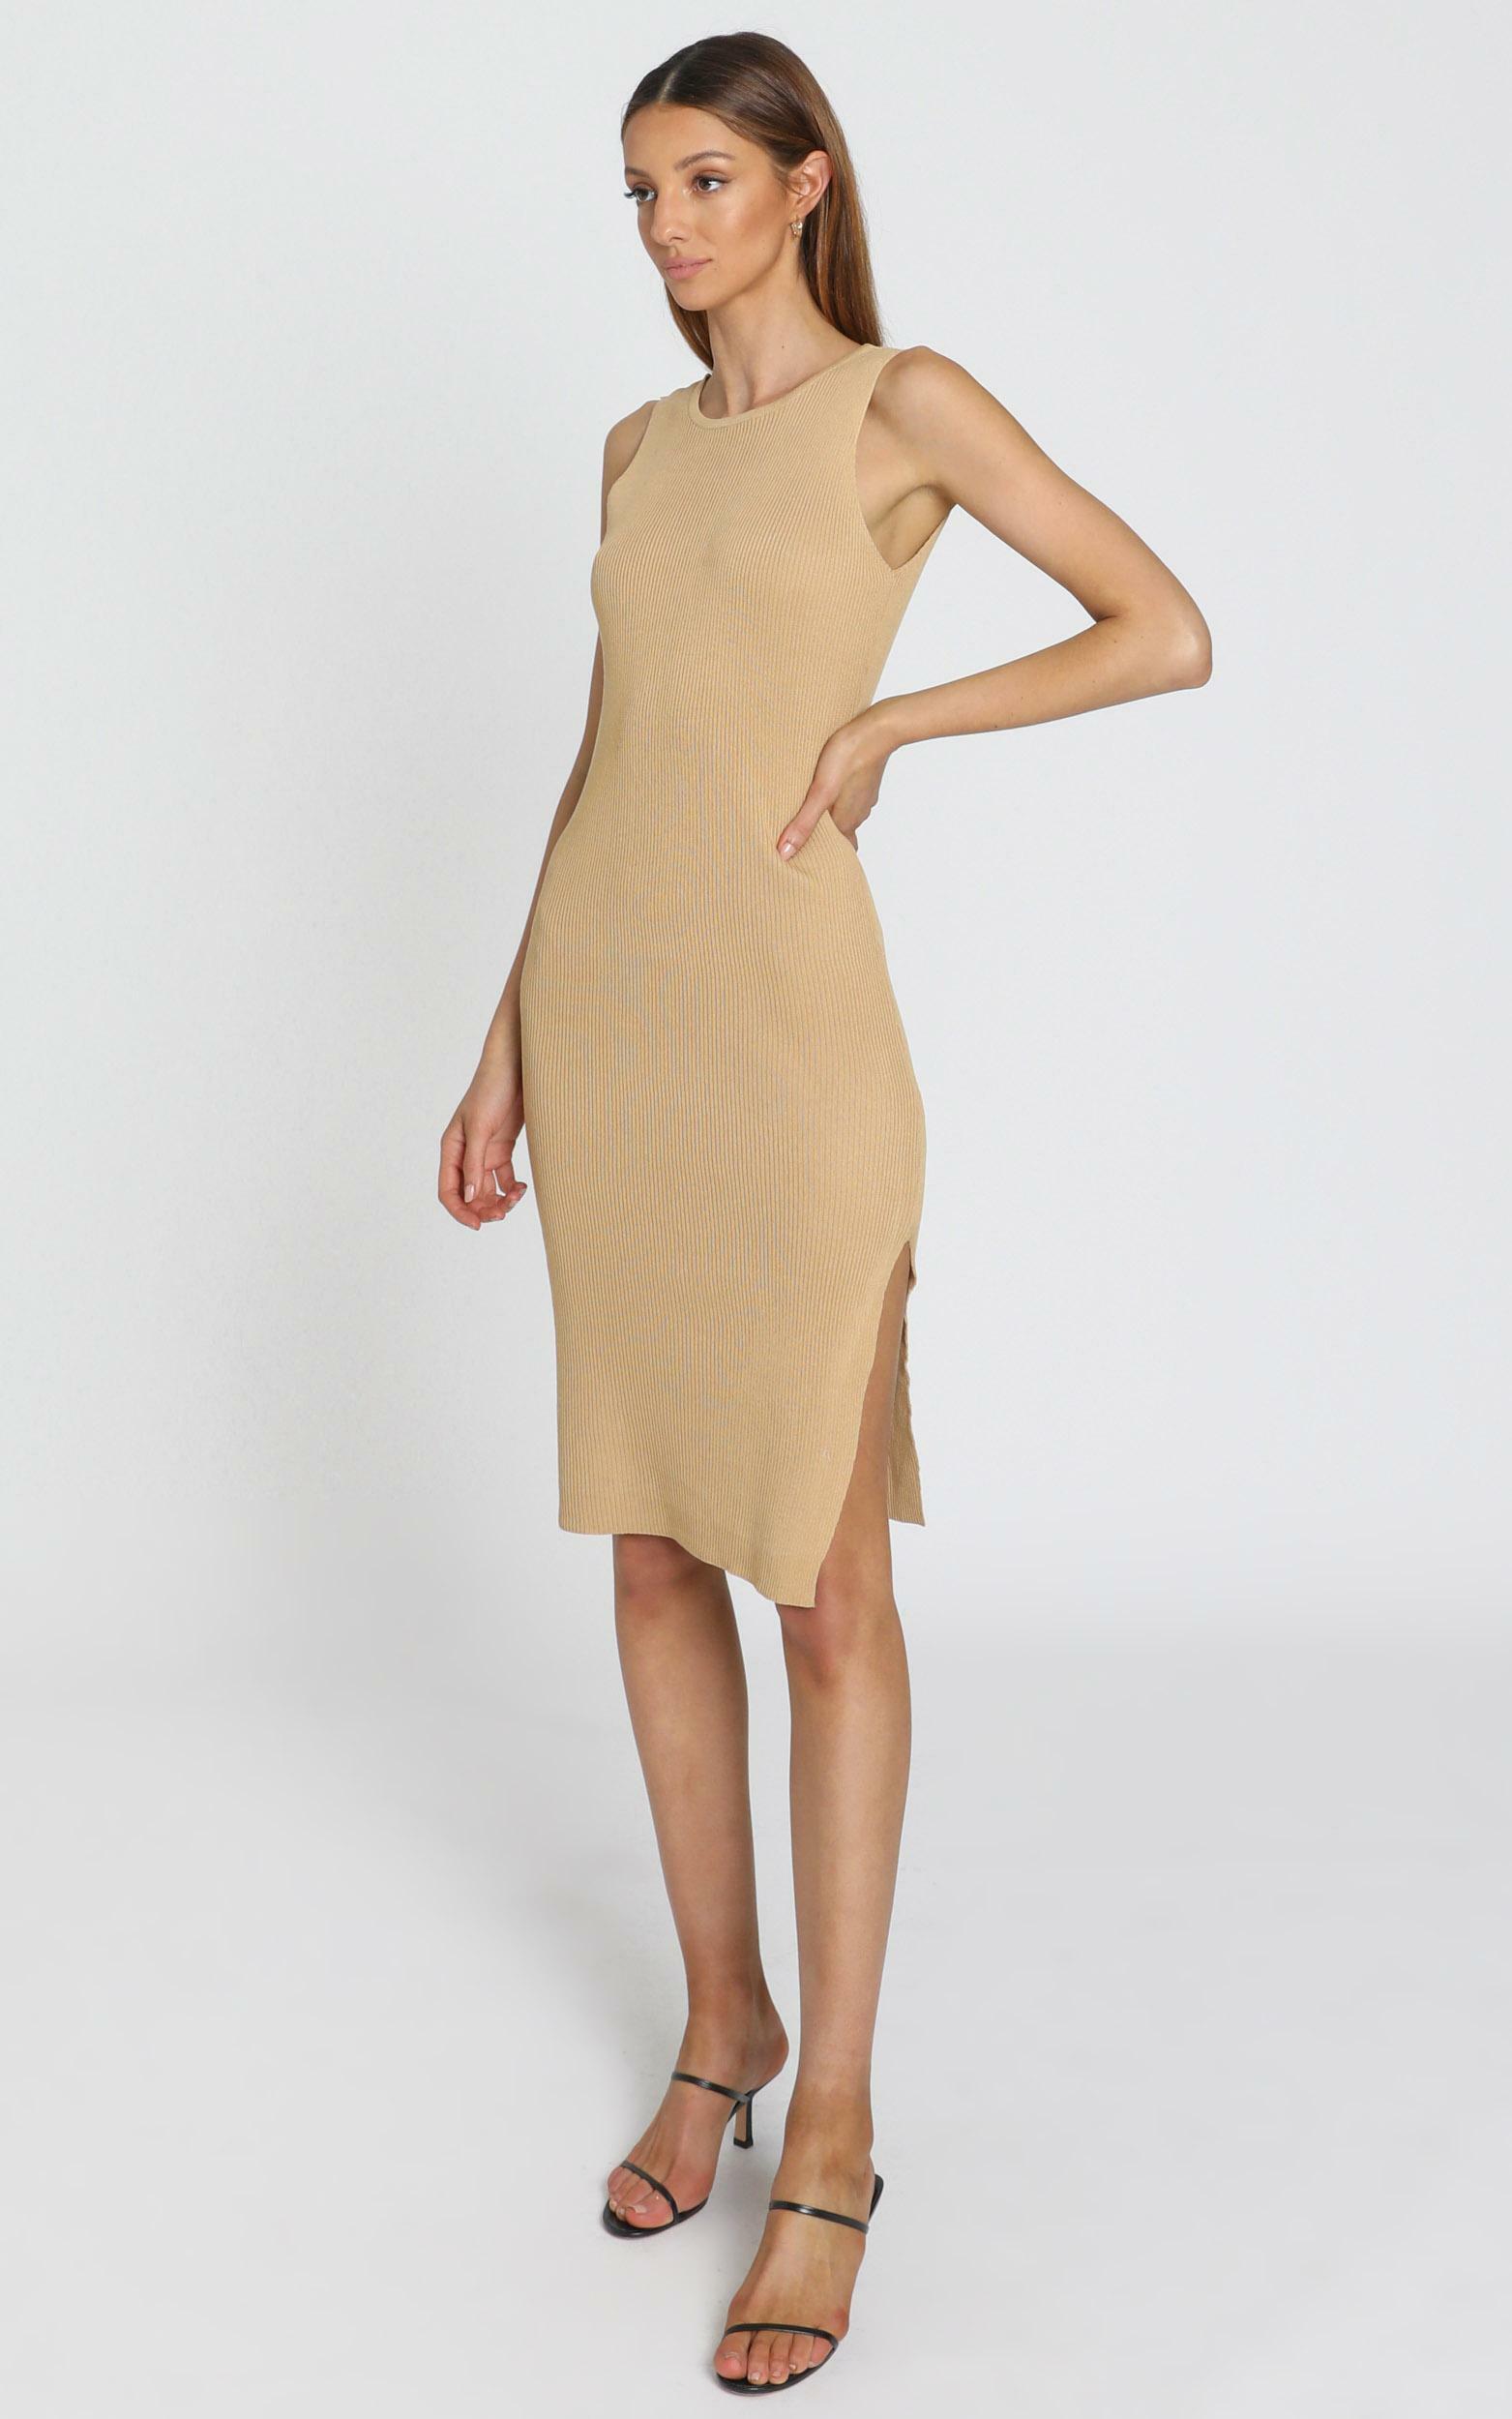 Callan Knit Dress in Mocha - M/L, Mocha, hi-res image number null